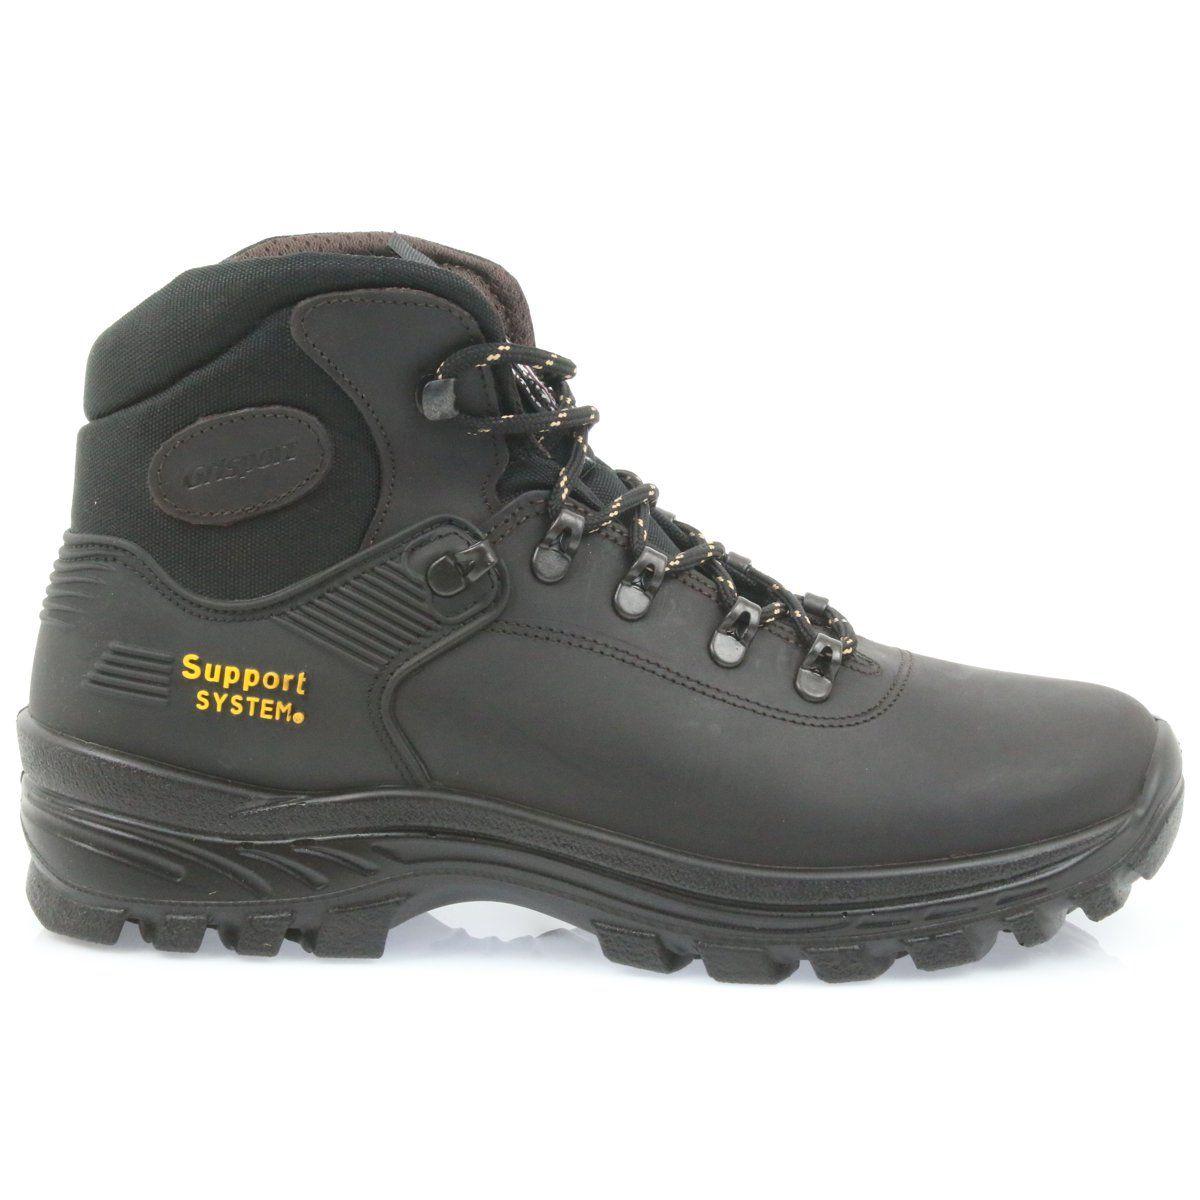 Grisport Buty Trekkingowe Czarne Hiking Boots Shoes Boots